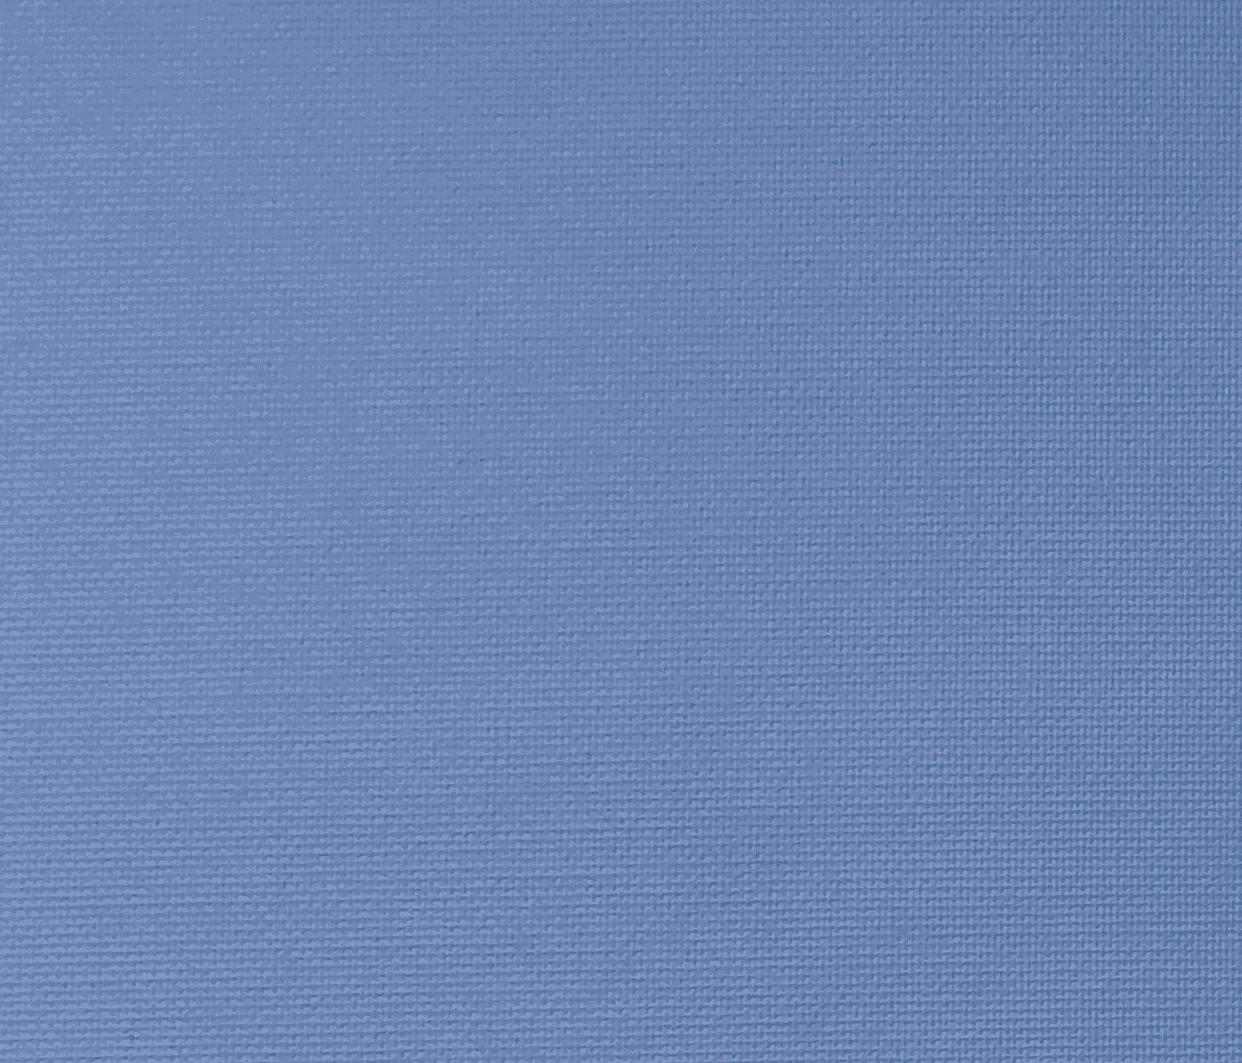 Eden Denim Blackout Fabric